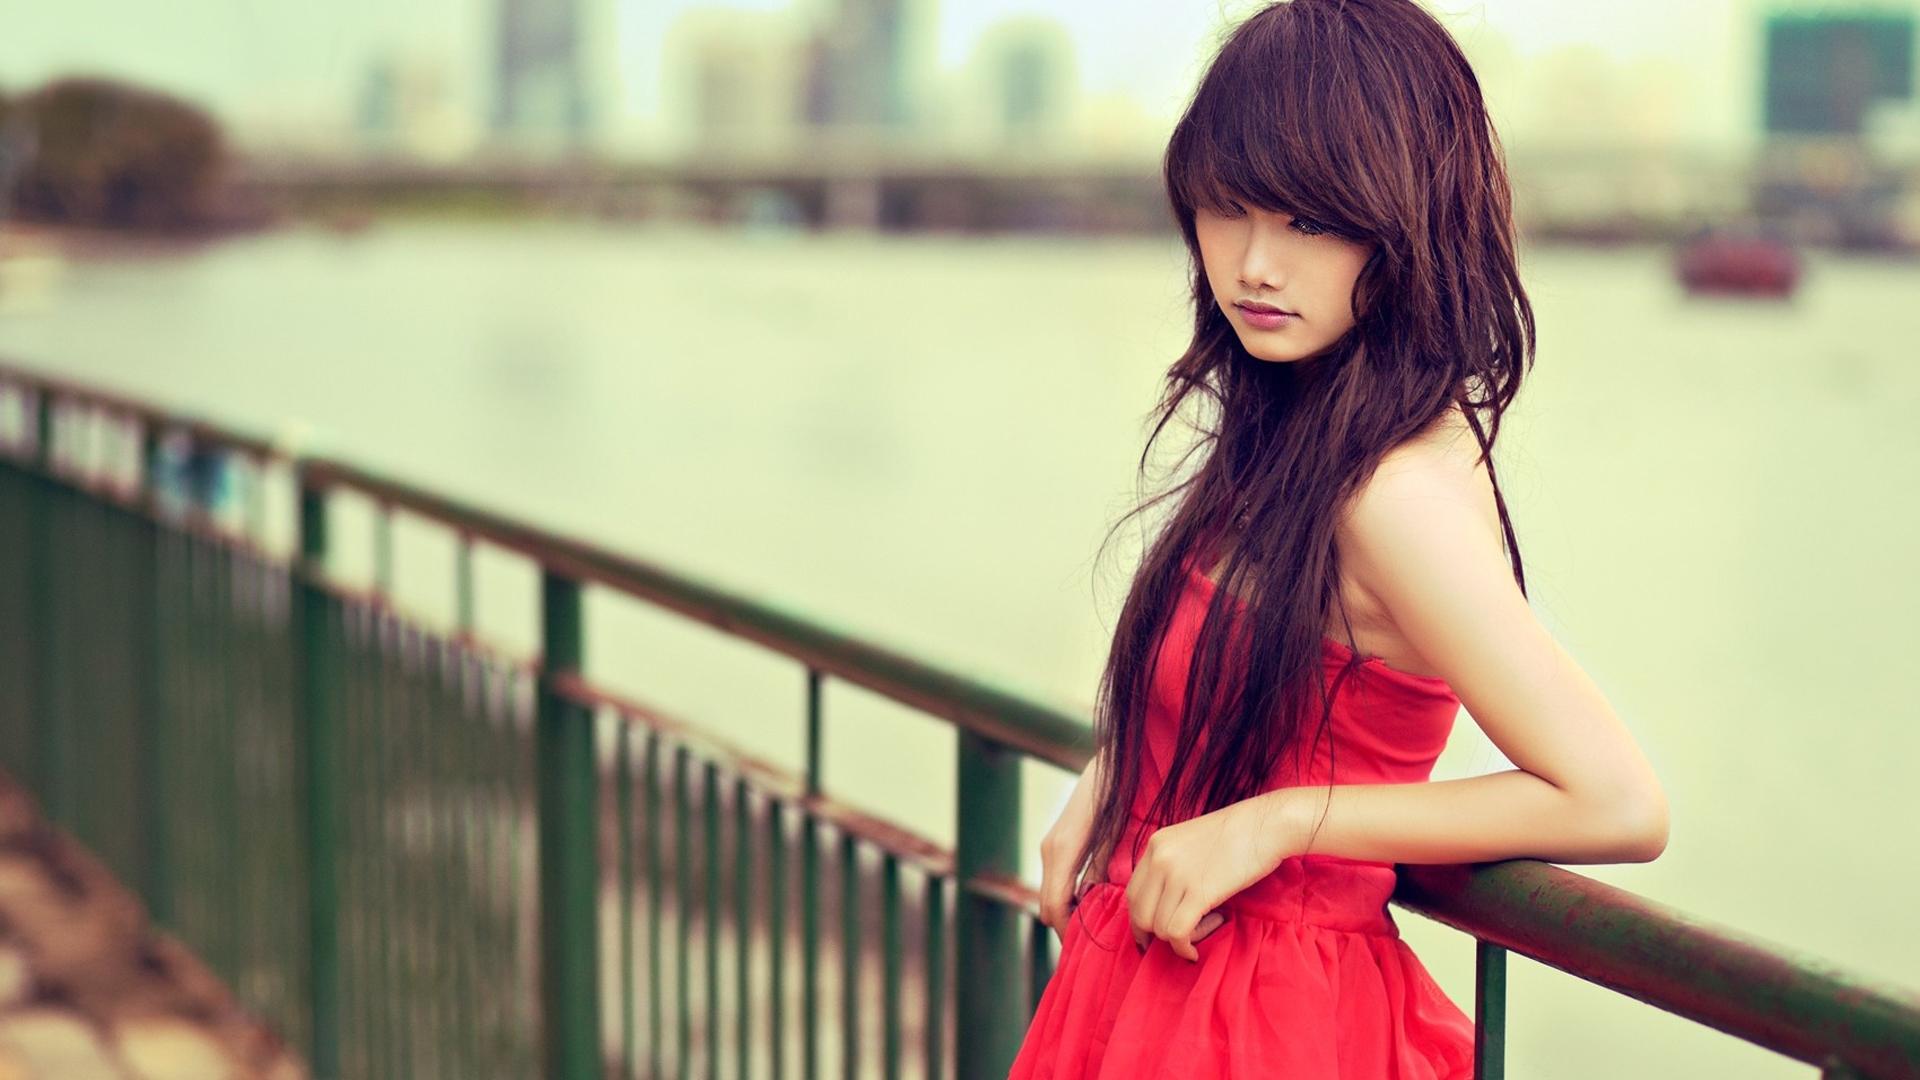 Donne - Asian  Woman Girl Sfondo